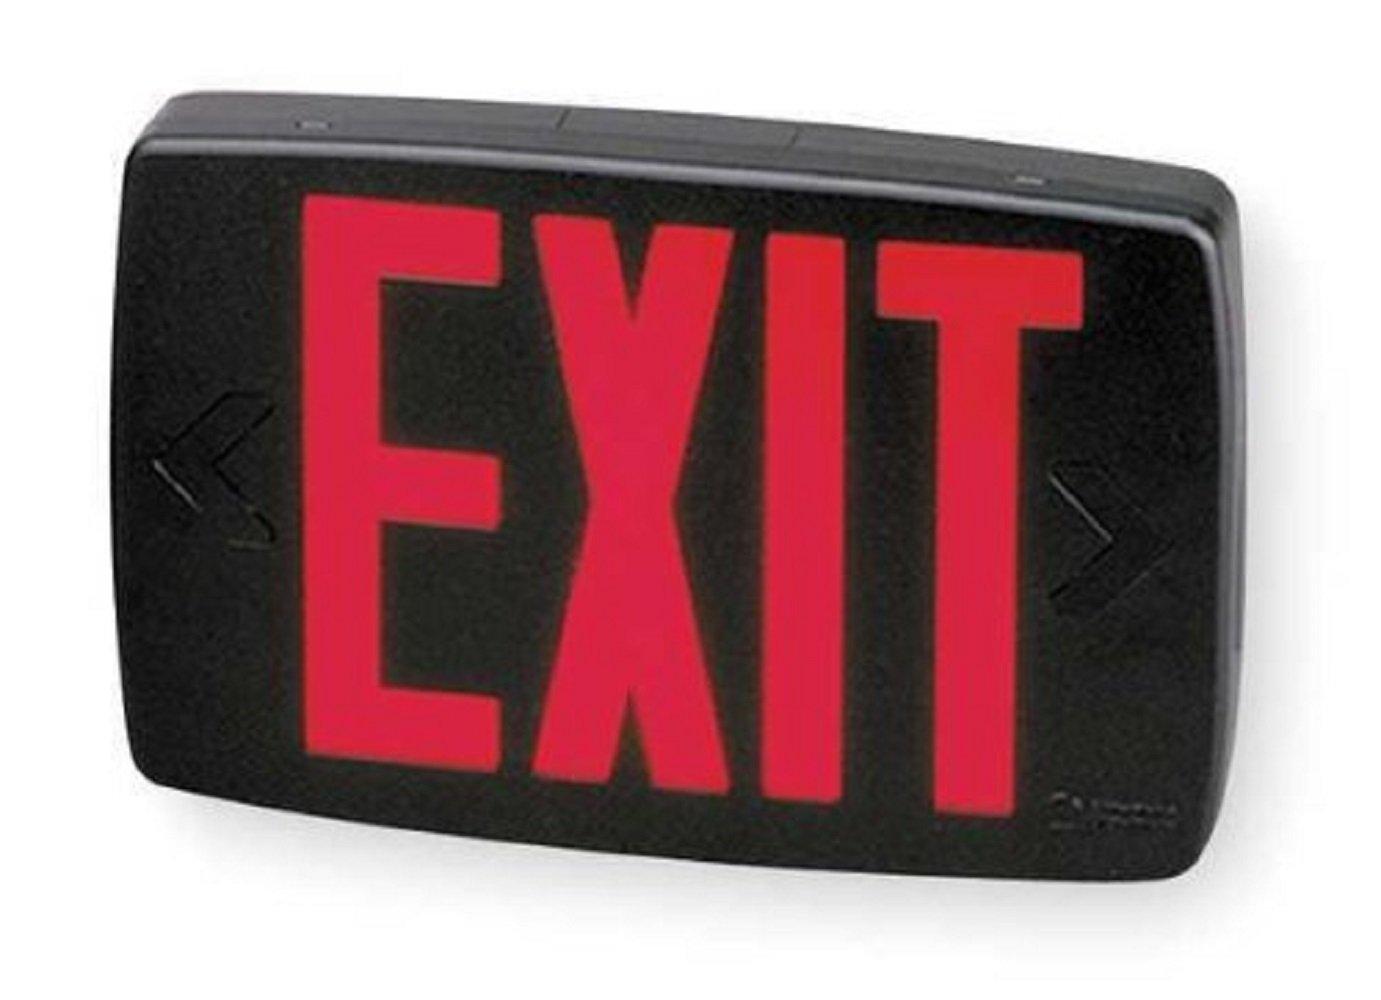 Lithonia Lighting LQM S 3 R 120/277 EL N M6 Quantum Thermoplastic LED Emergency Exit Sign